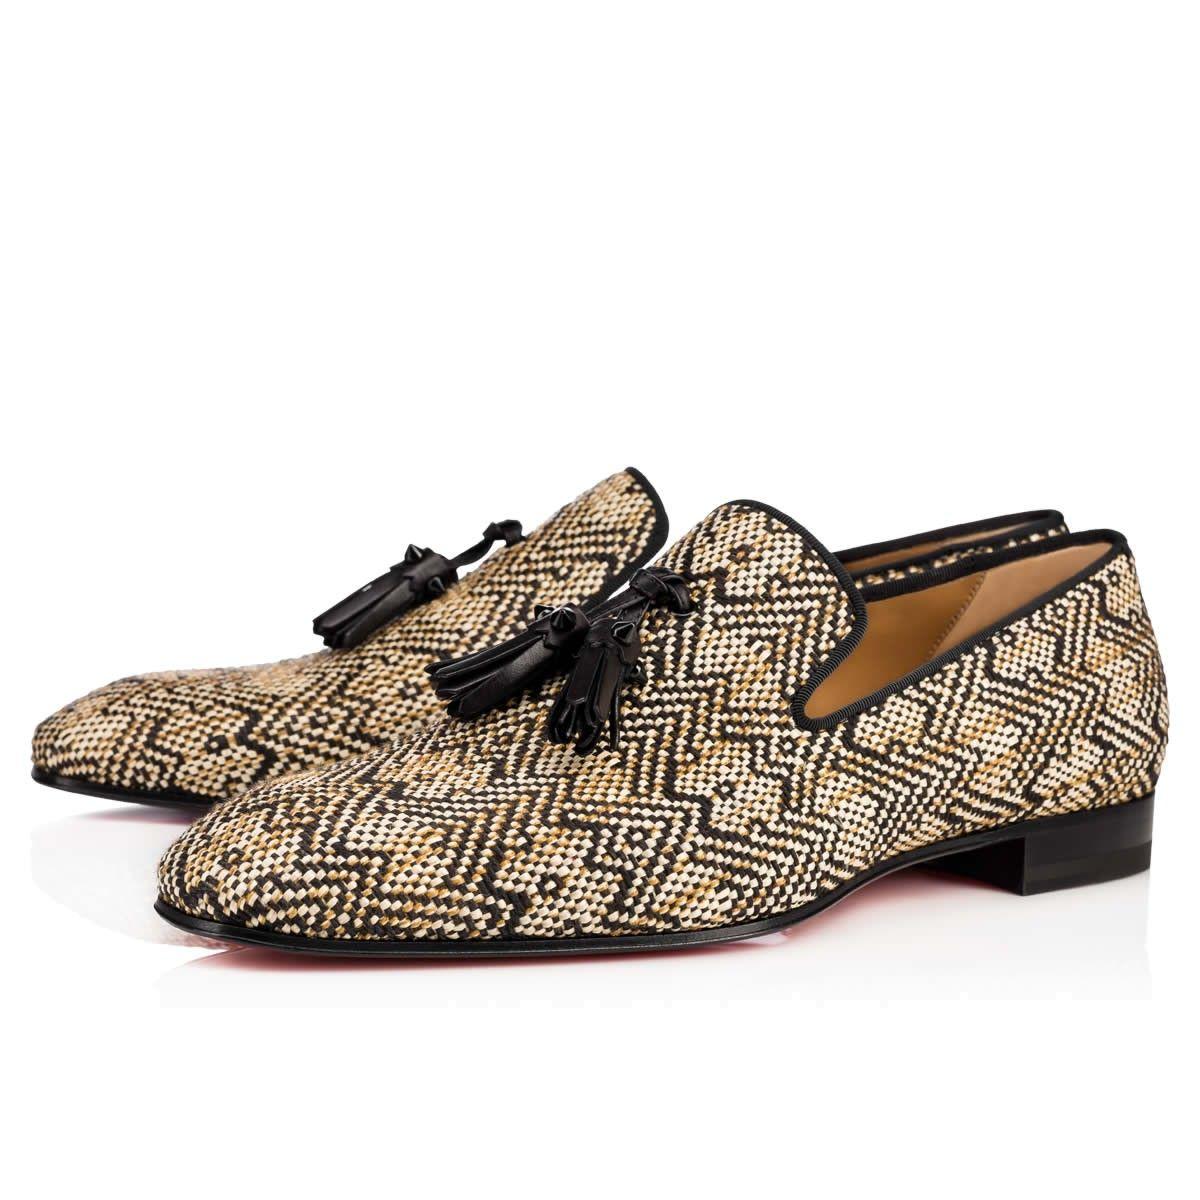 Shoes - Dandelion Tassel Flat - Christian Louboutin f1780281c3